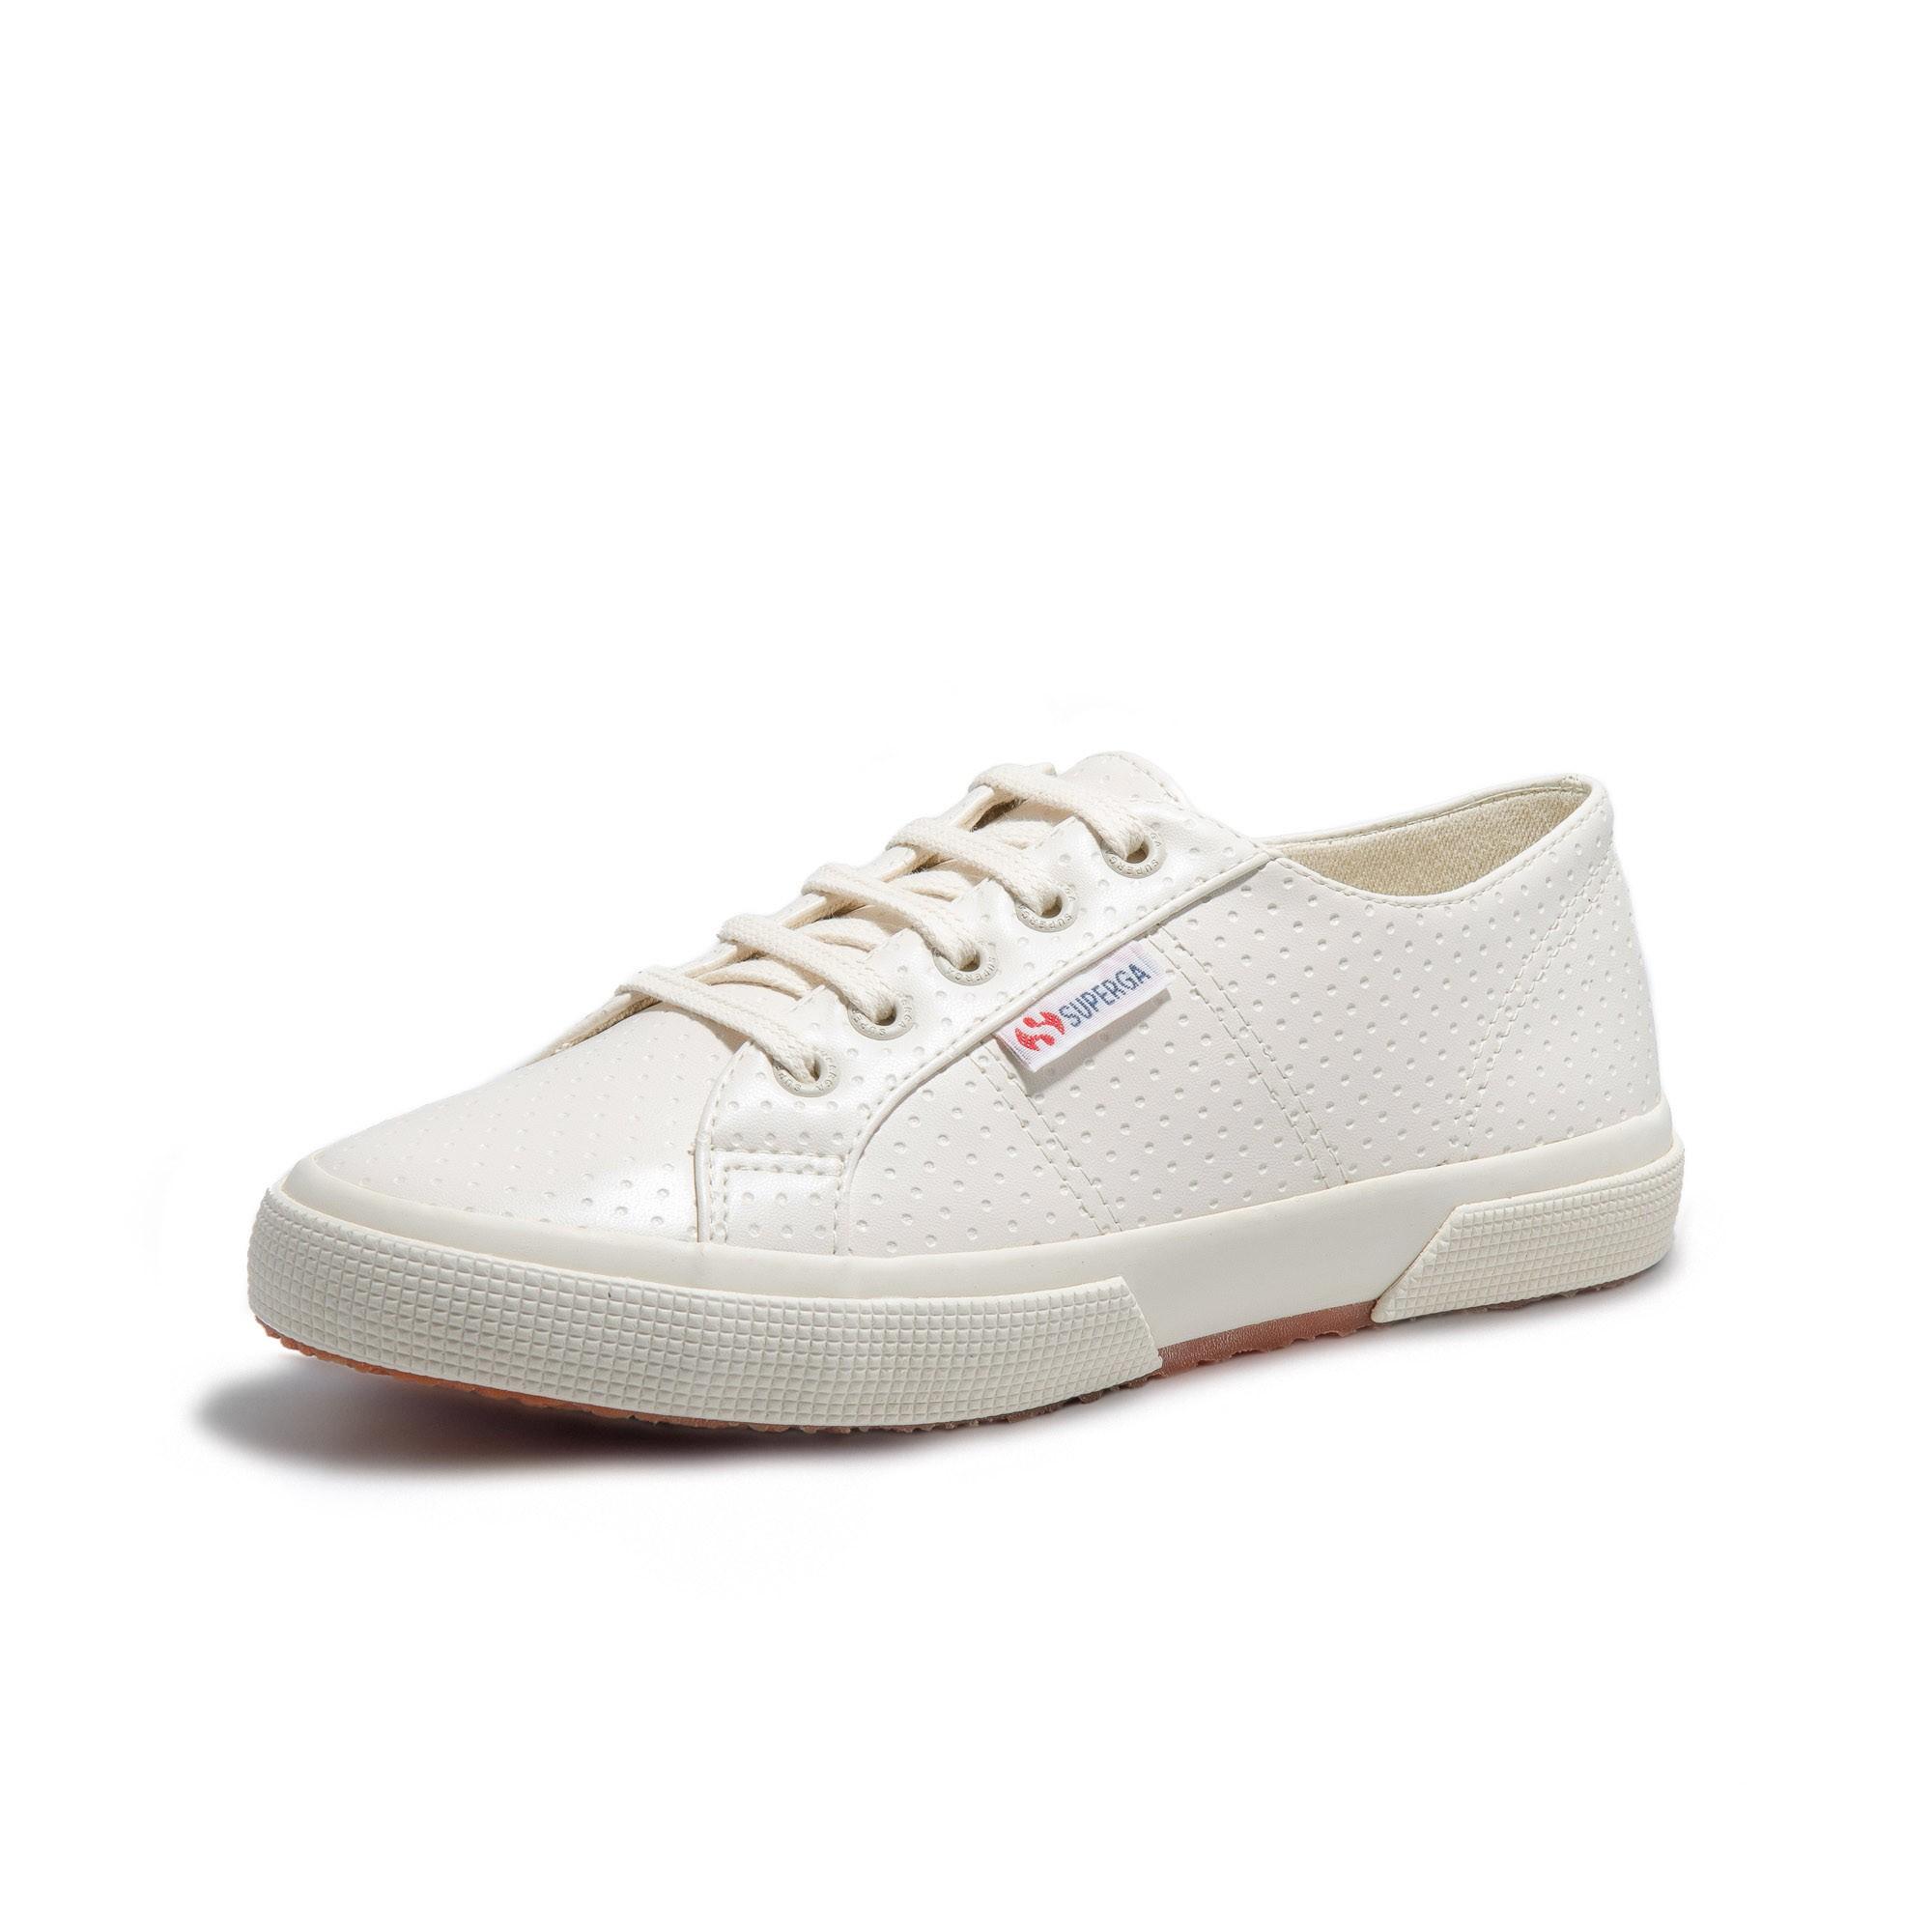 2750 COTU CLASSIC PERFURADO OFF WHITE